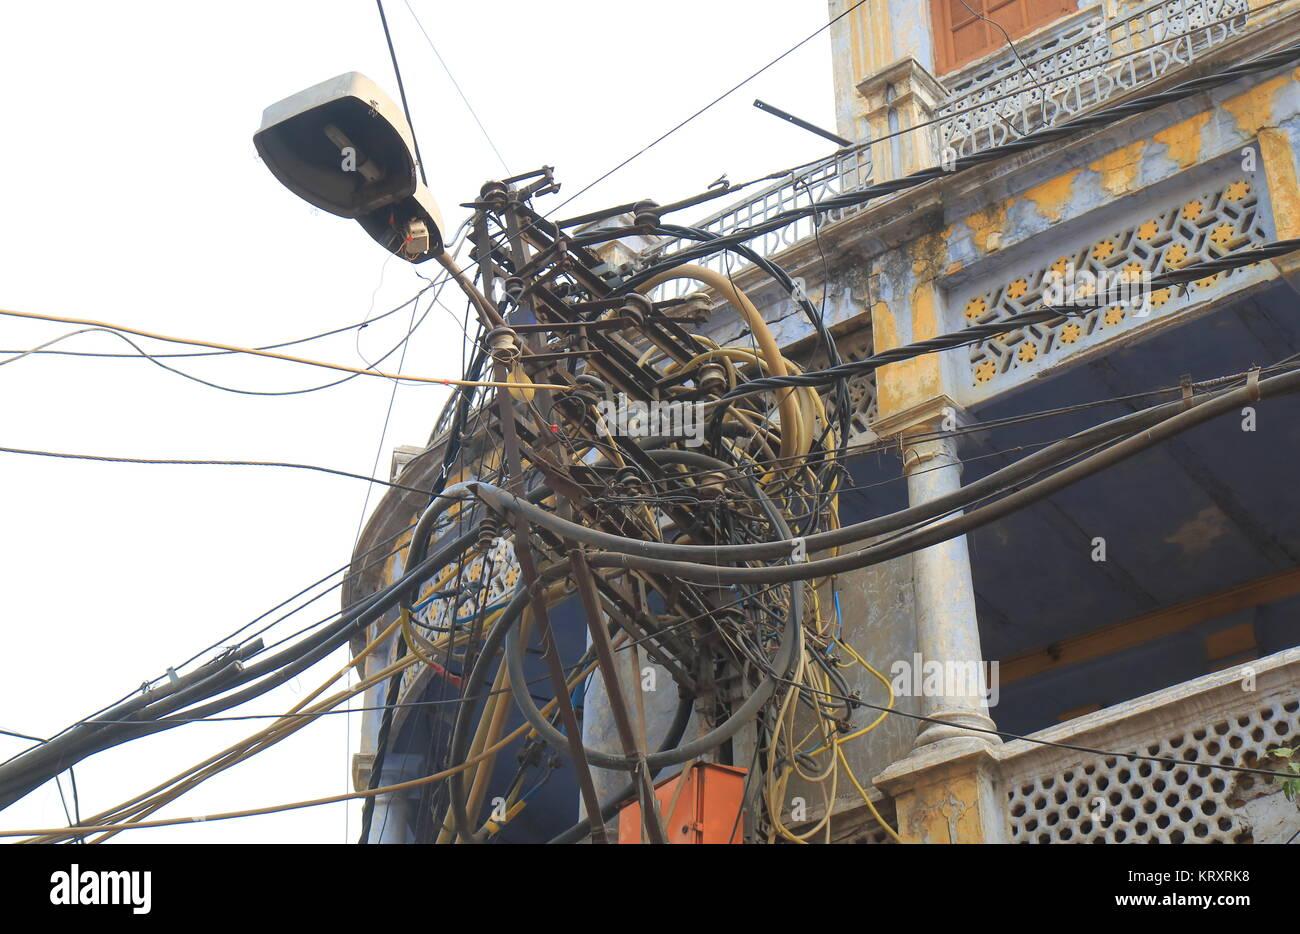 Electric wire telephone pole Delhi India Stock Photo: 169619724 - Alamy